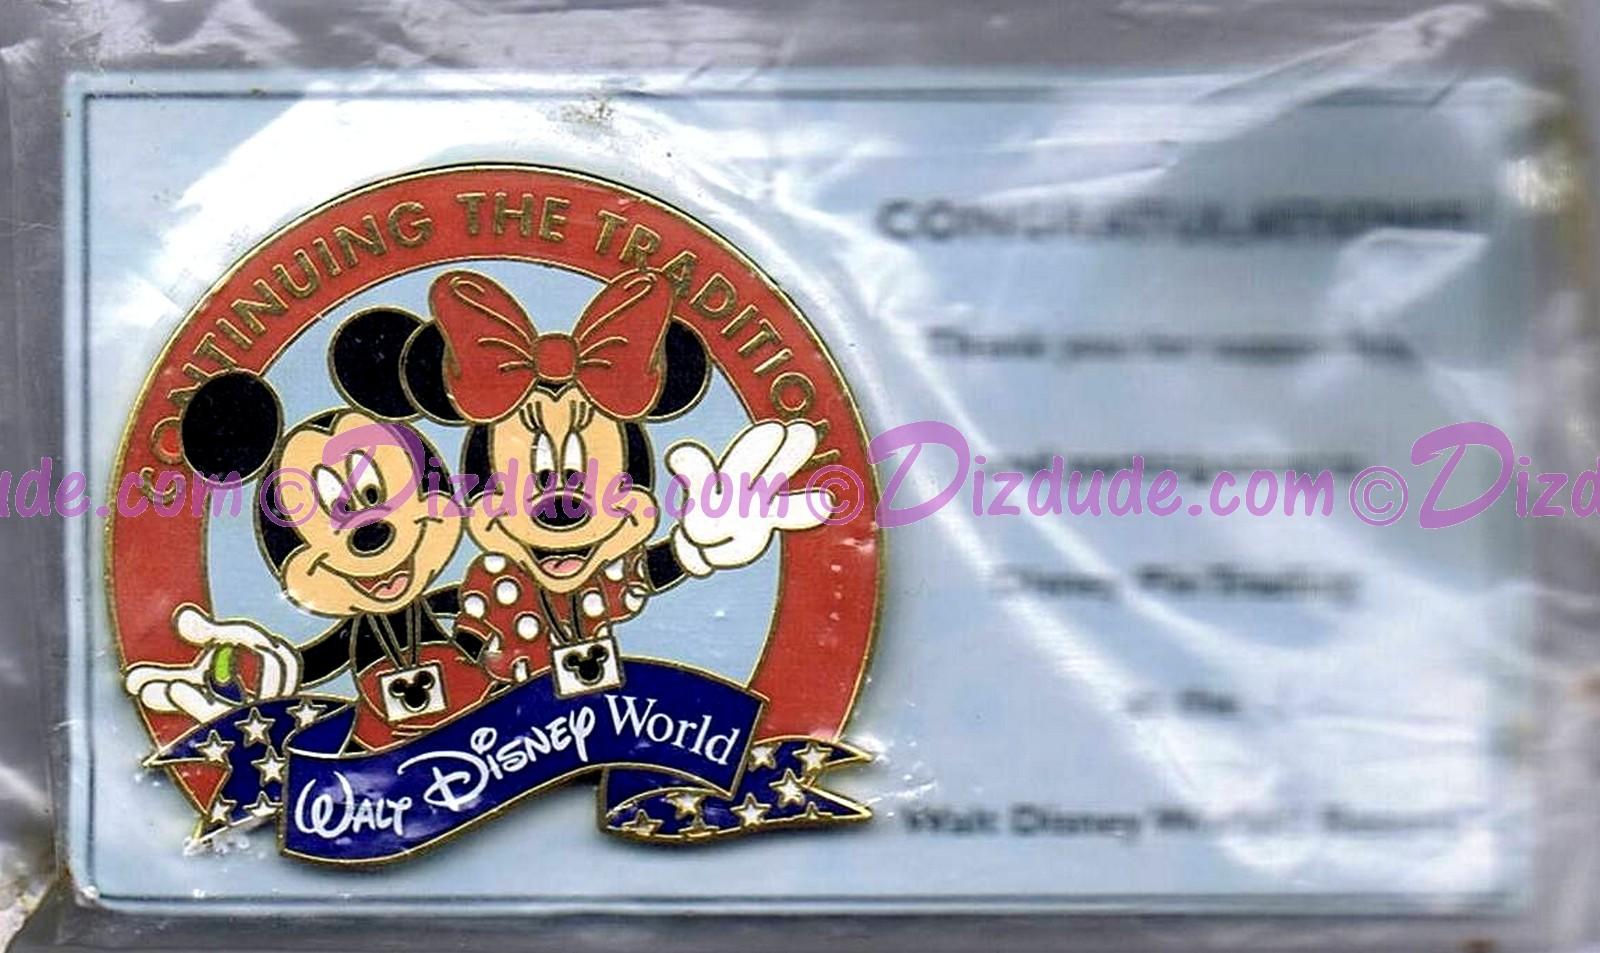 Walt Disney World Continuing the Tradition 2002 with Mickey & Minnie Pin © Dizdude.com